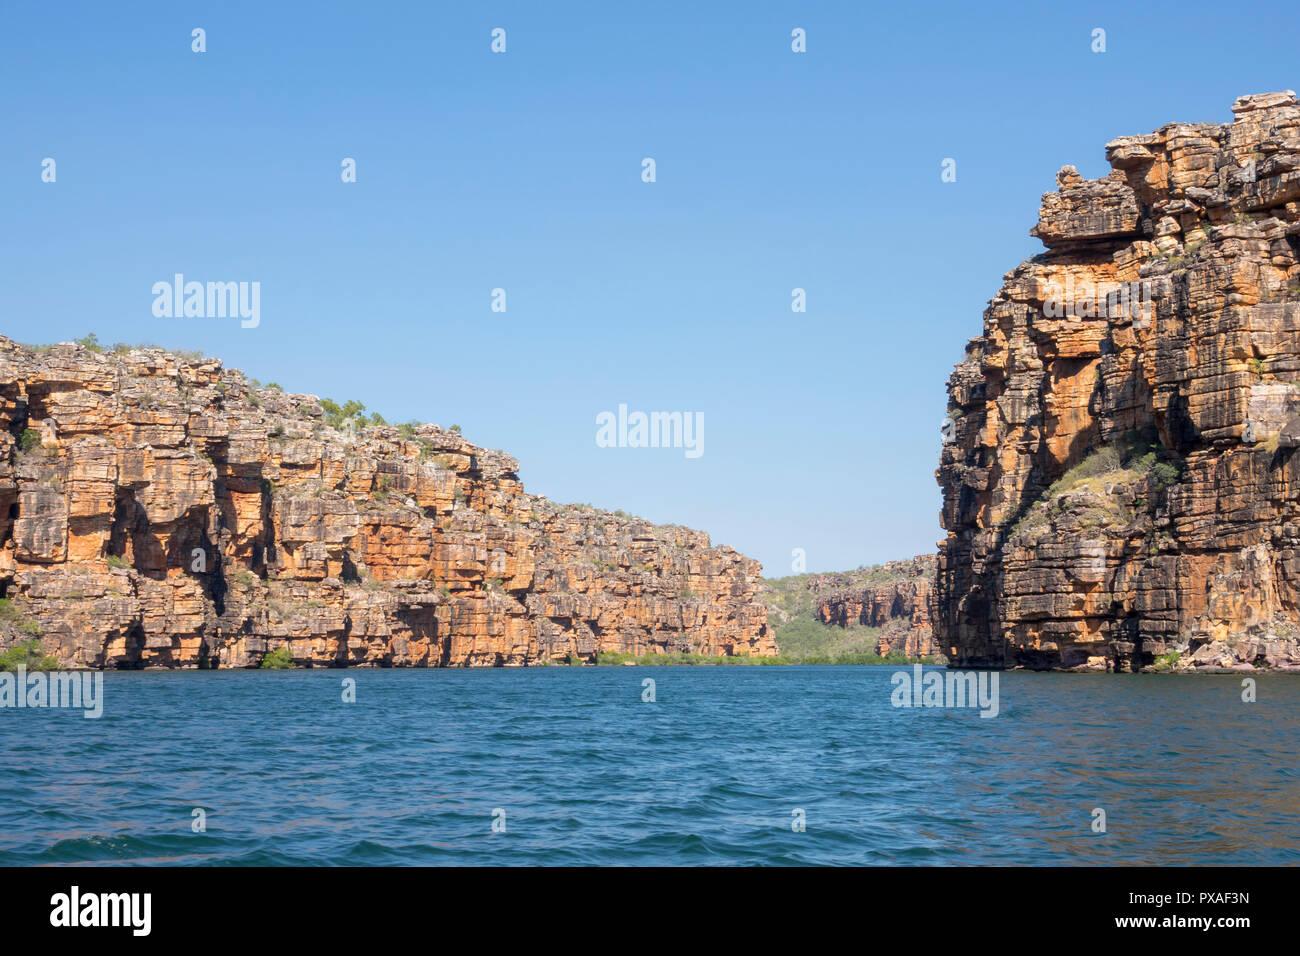 Zodiac cruising on the King George River, Kimberley Coast, Western Australia - Stock Image